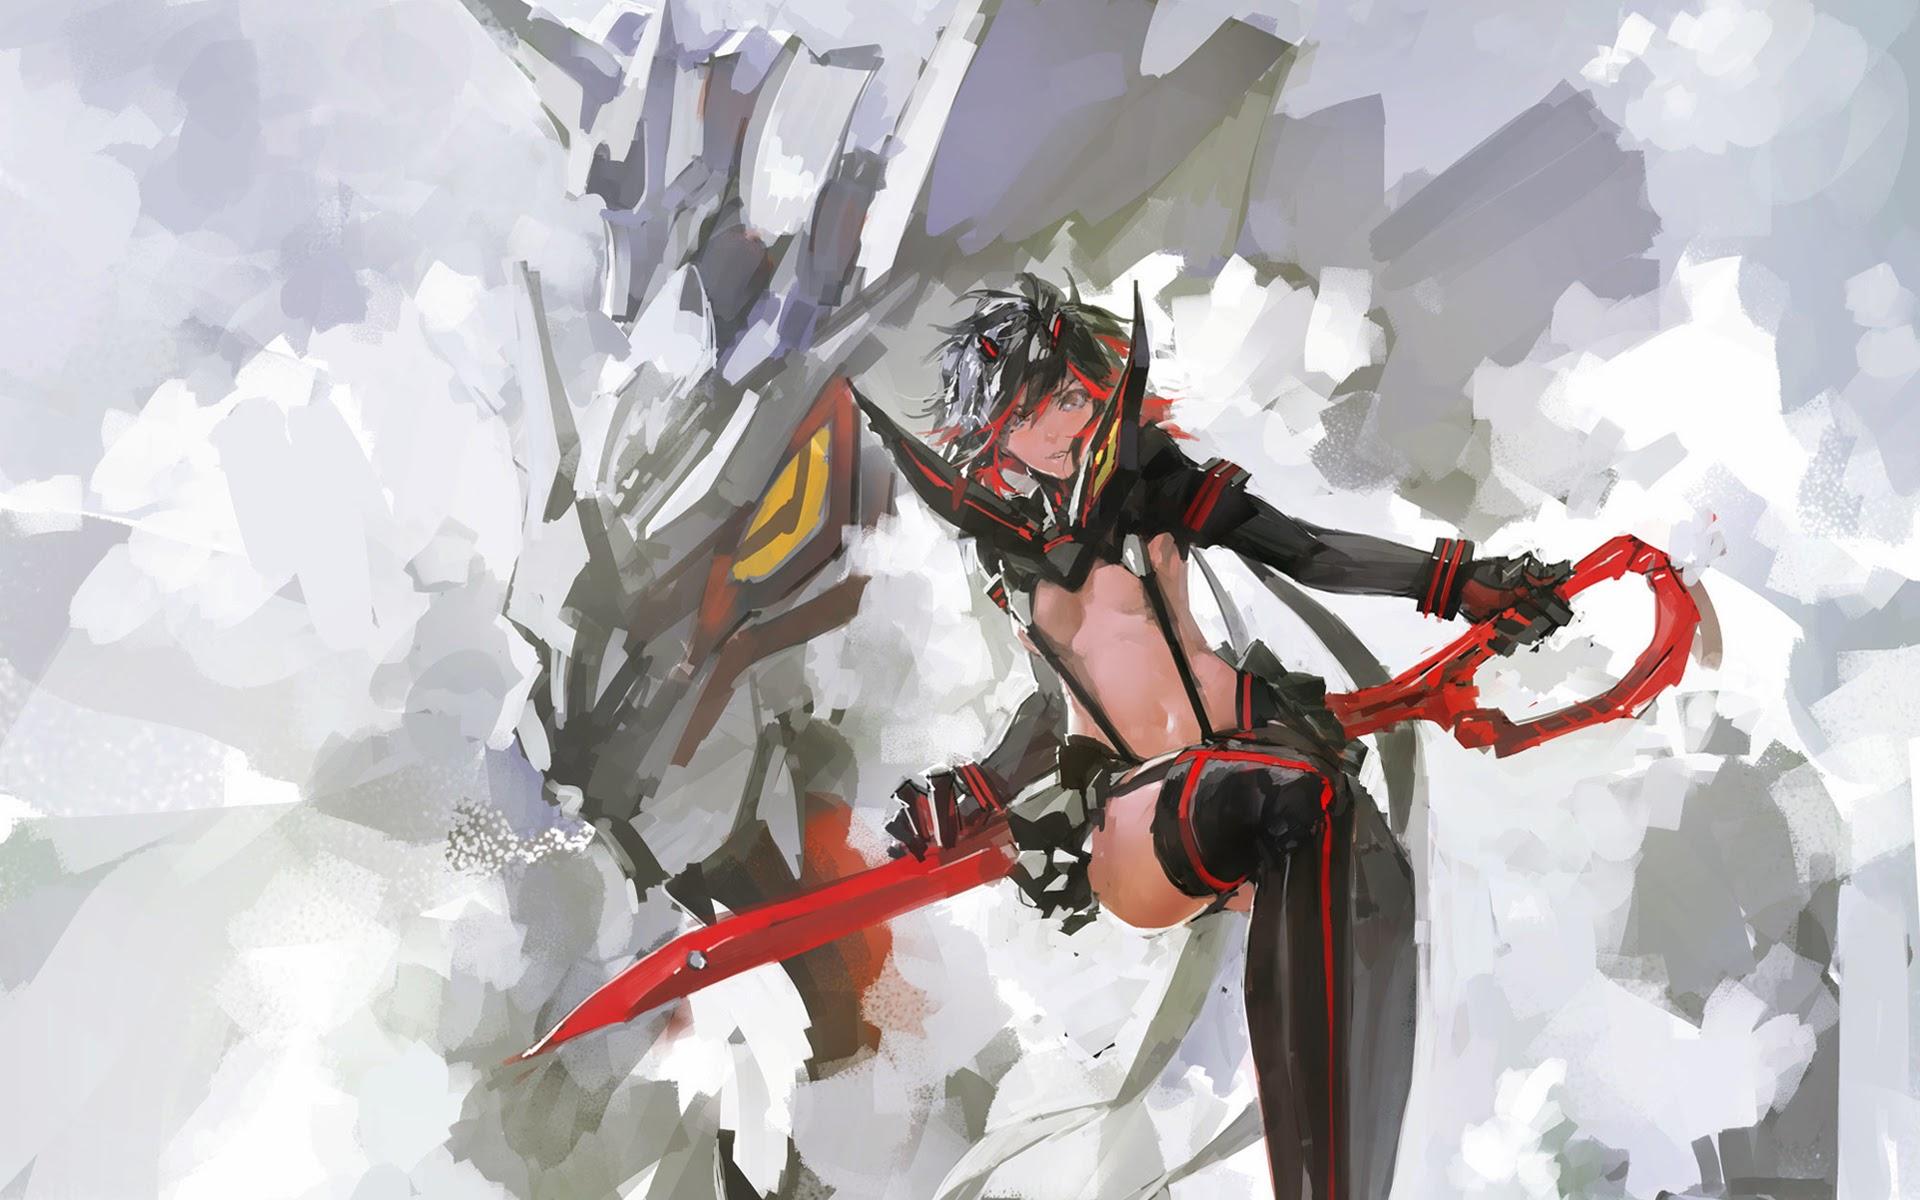 Anime Kill La Kill 15 Cool Hd Wallpaper Animewp Com